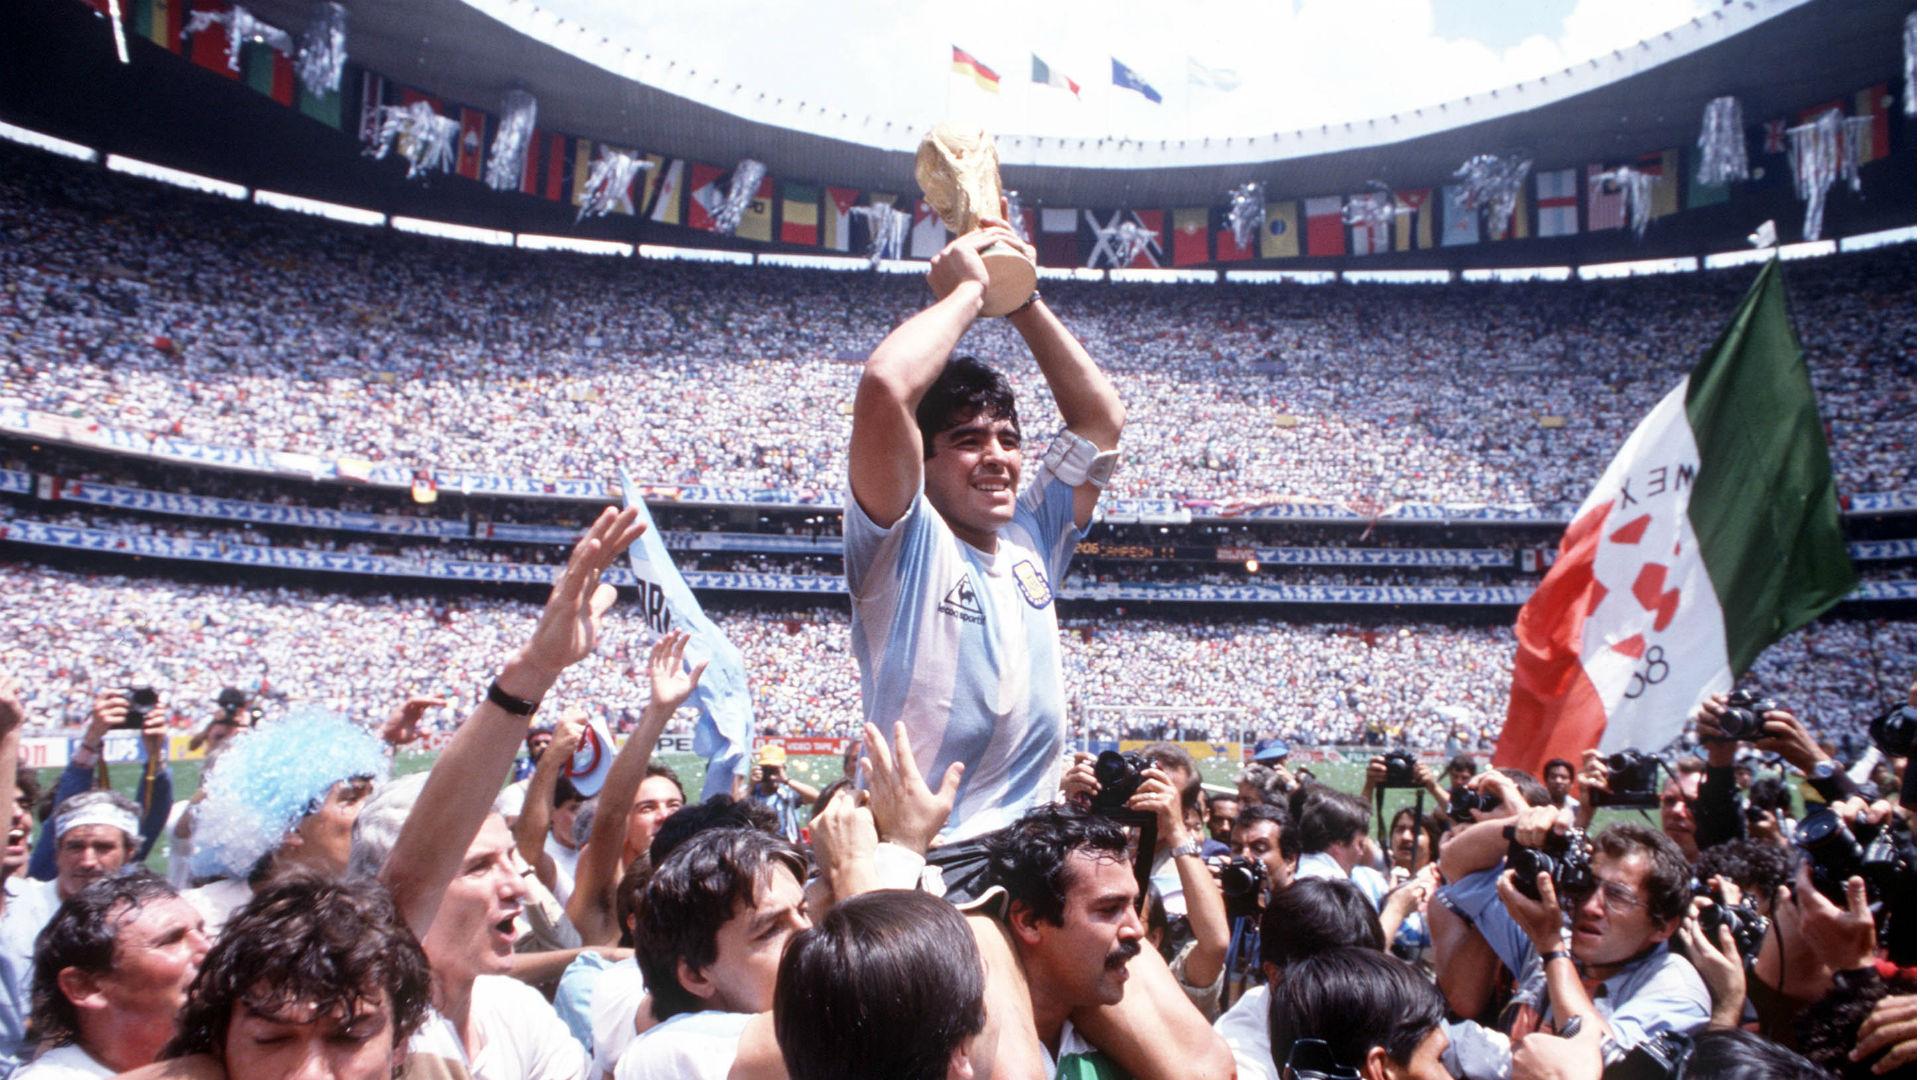 Diego Maradona dies: The Golden Boy leaves an eternal legacy